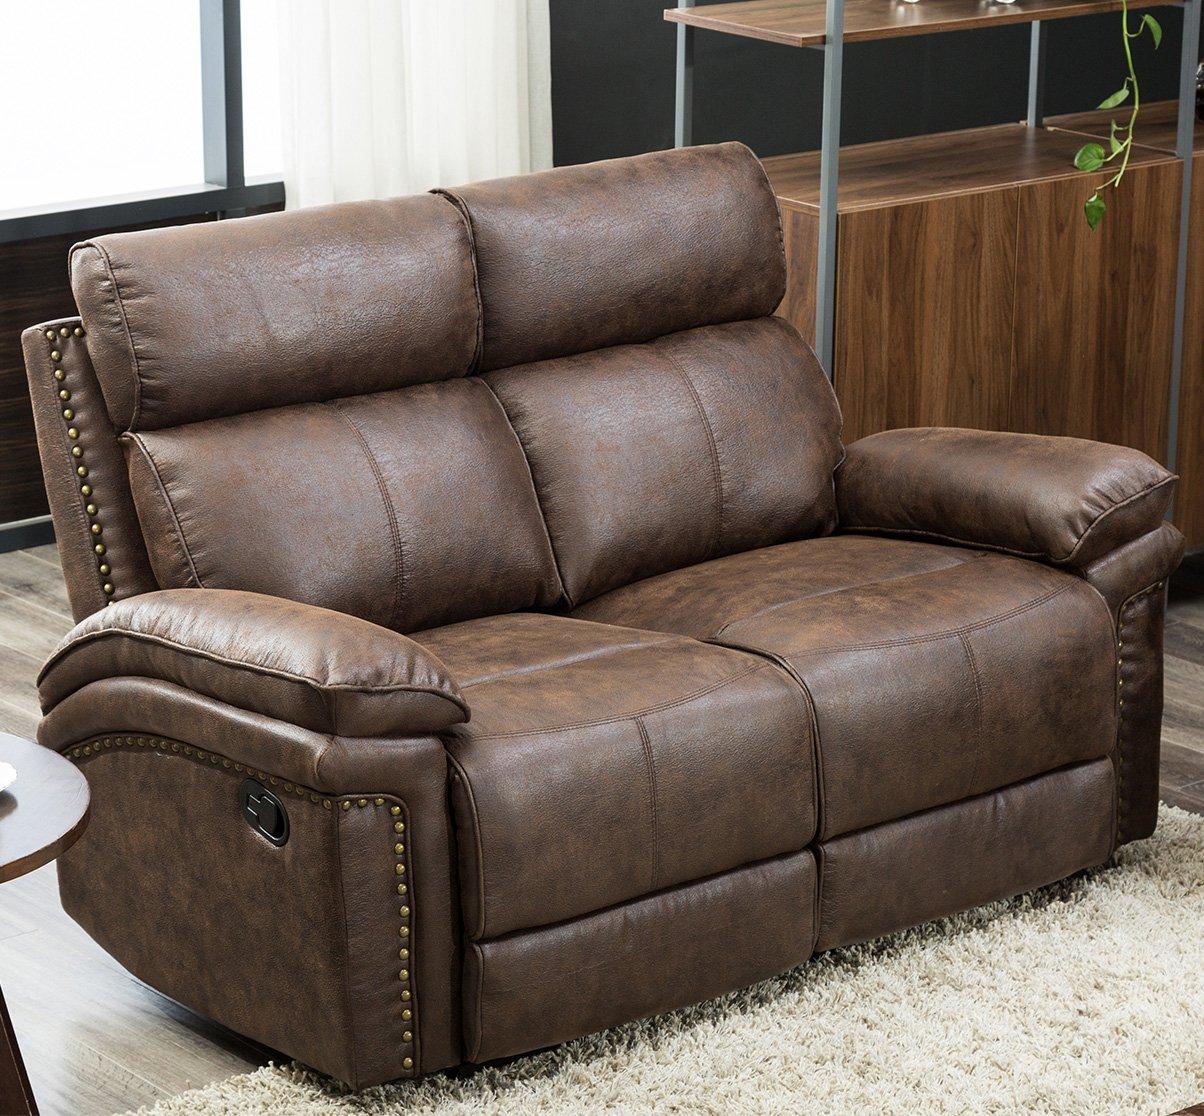 Amazon.com: Harper & Bright Designs Living-Room Sectional Recliner ...